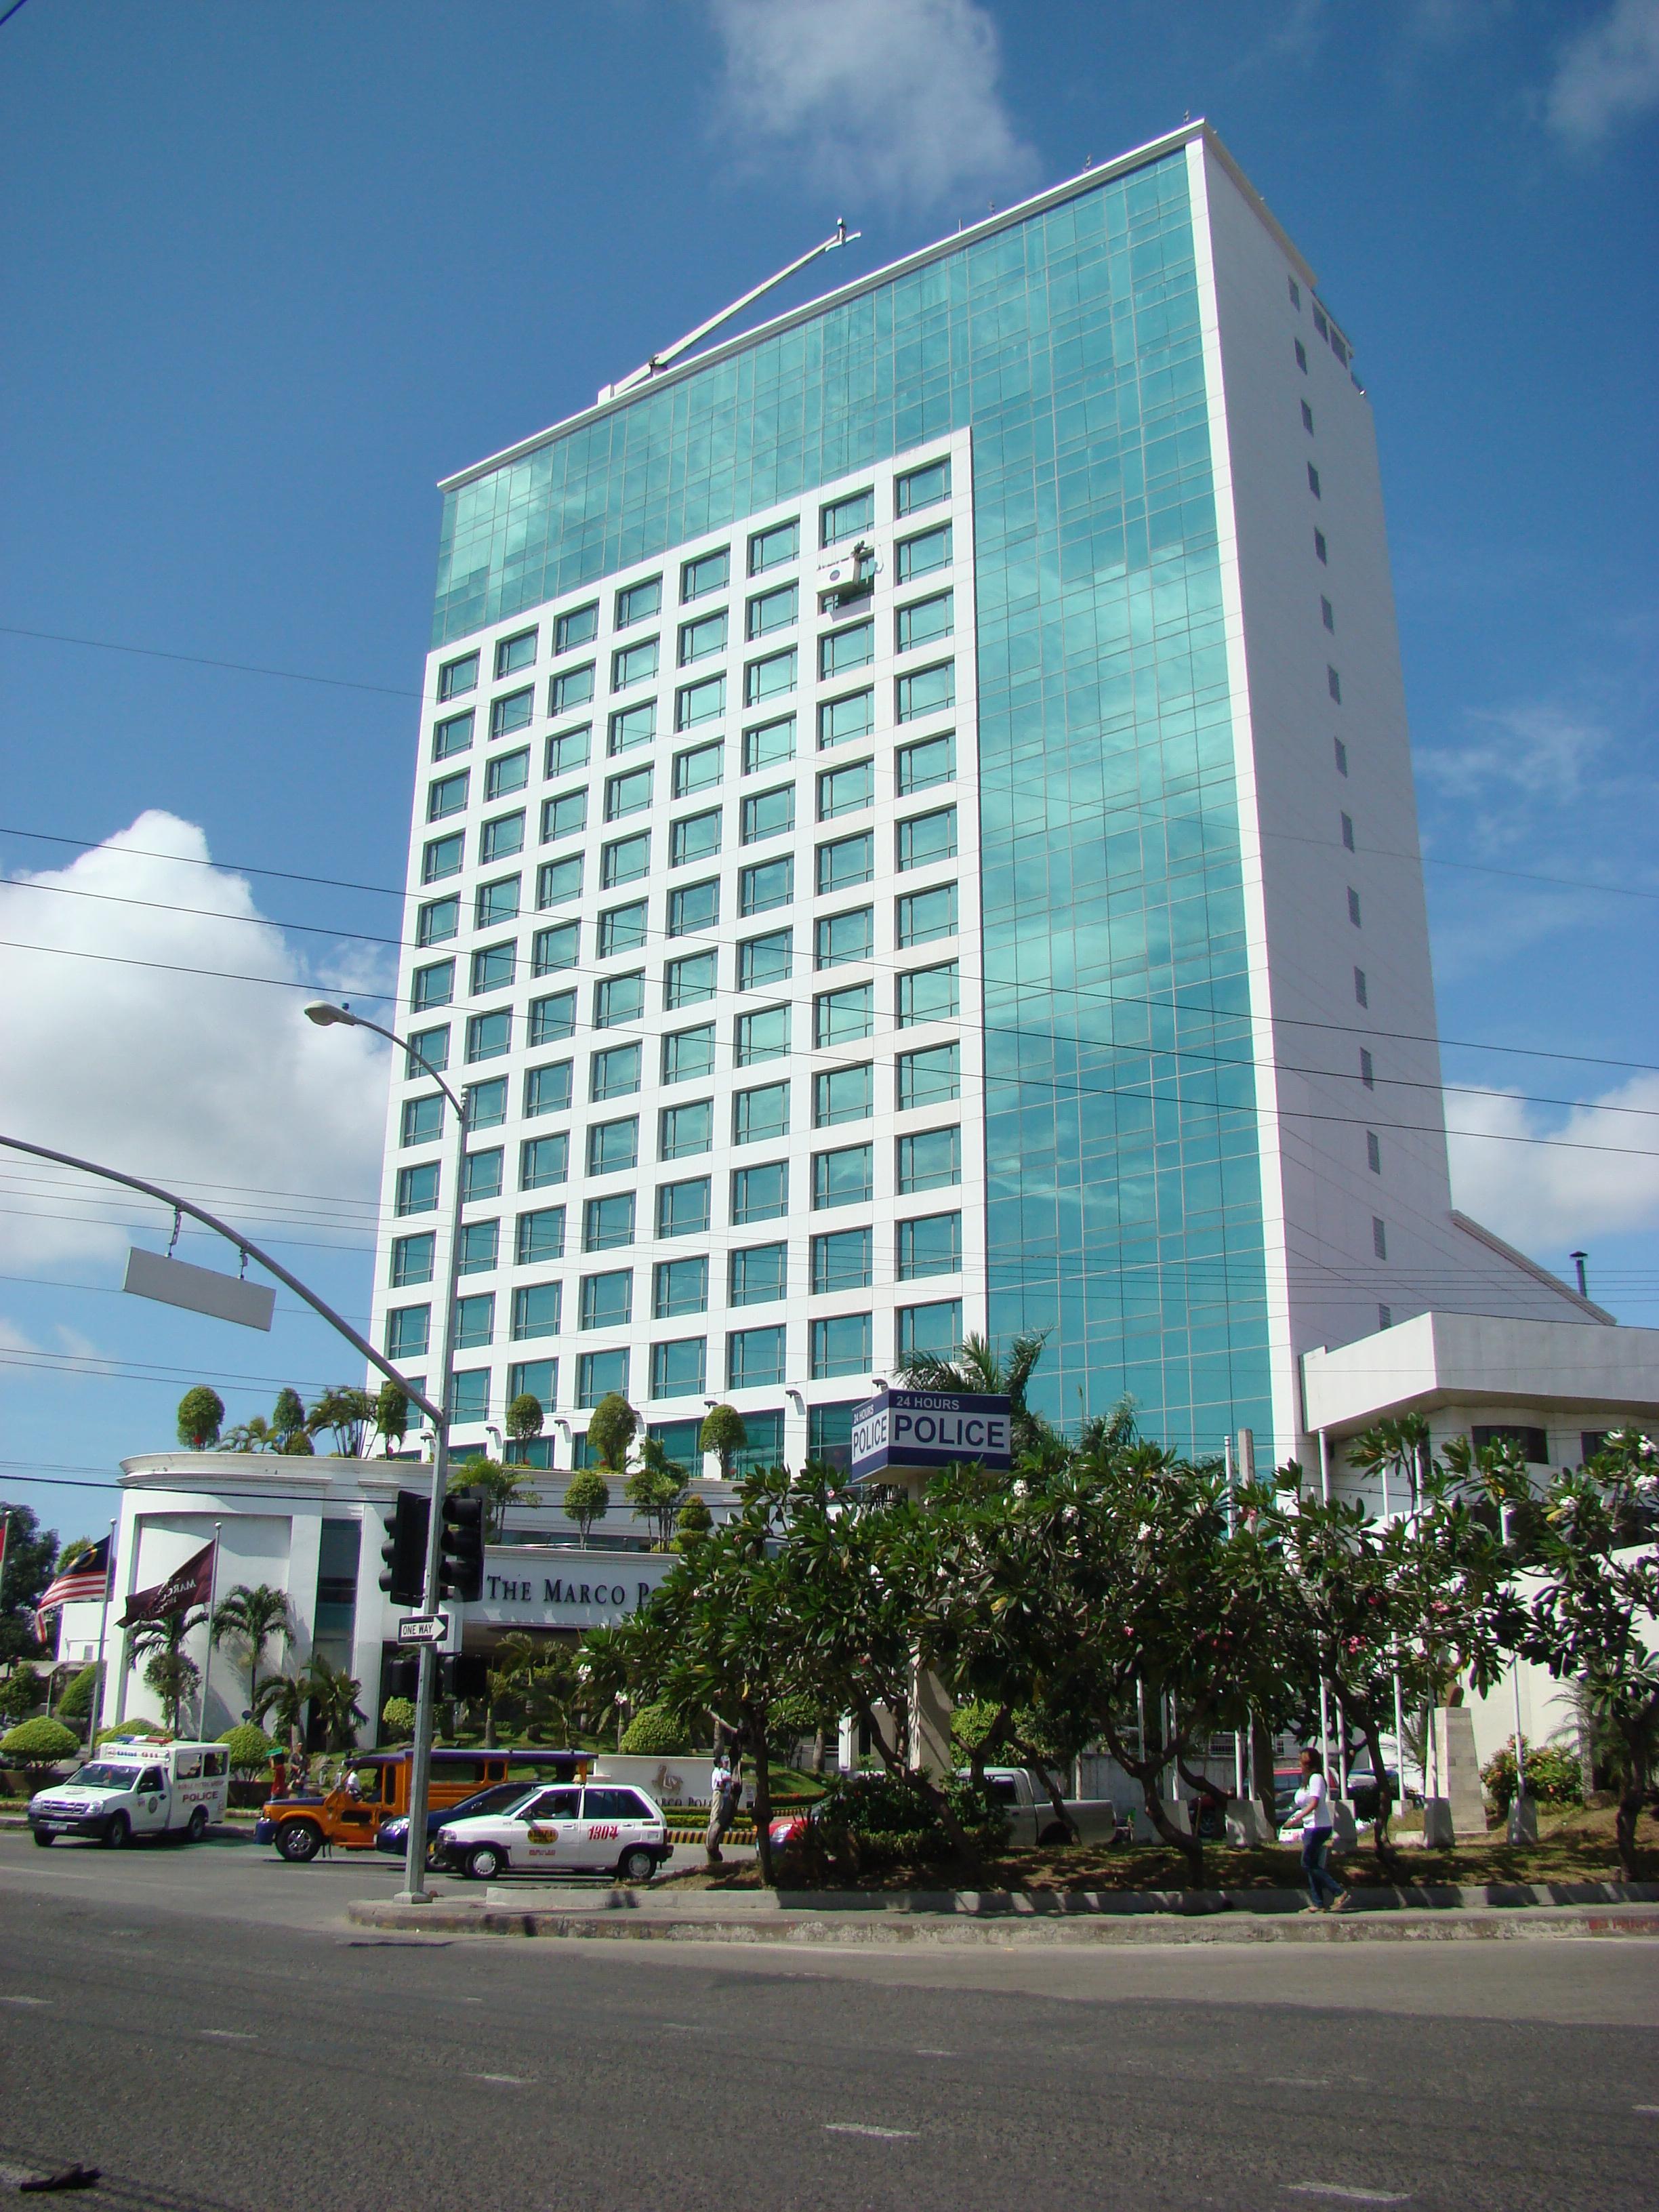 Davao City Recreation Center  Wikipedia. Saboey Resort & Villas. Diana Plaza Hotel. Gooromon Park Cottages. Bristol Hotel. Rayentray Hotel. Grand Hyatt Beijing Hotel. The Datai Langkawi. Bailbrook Lodge